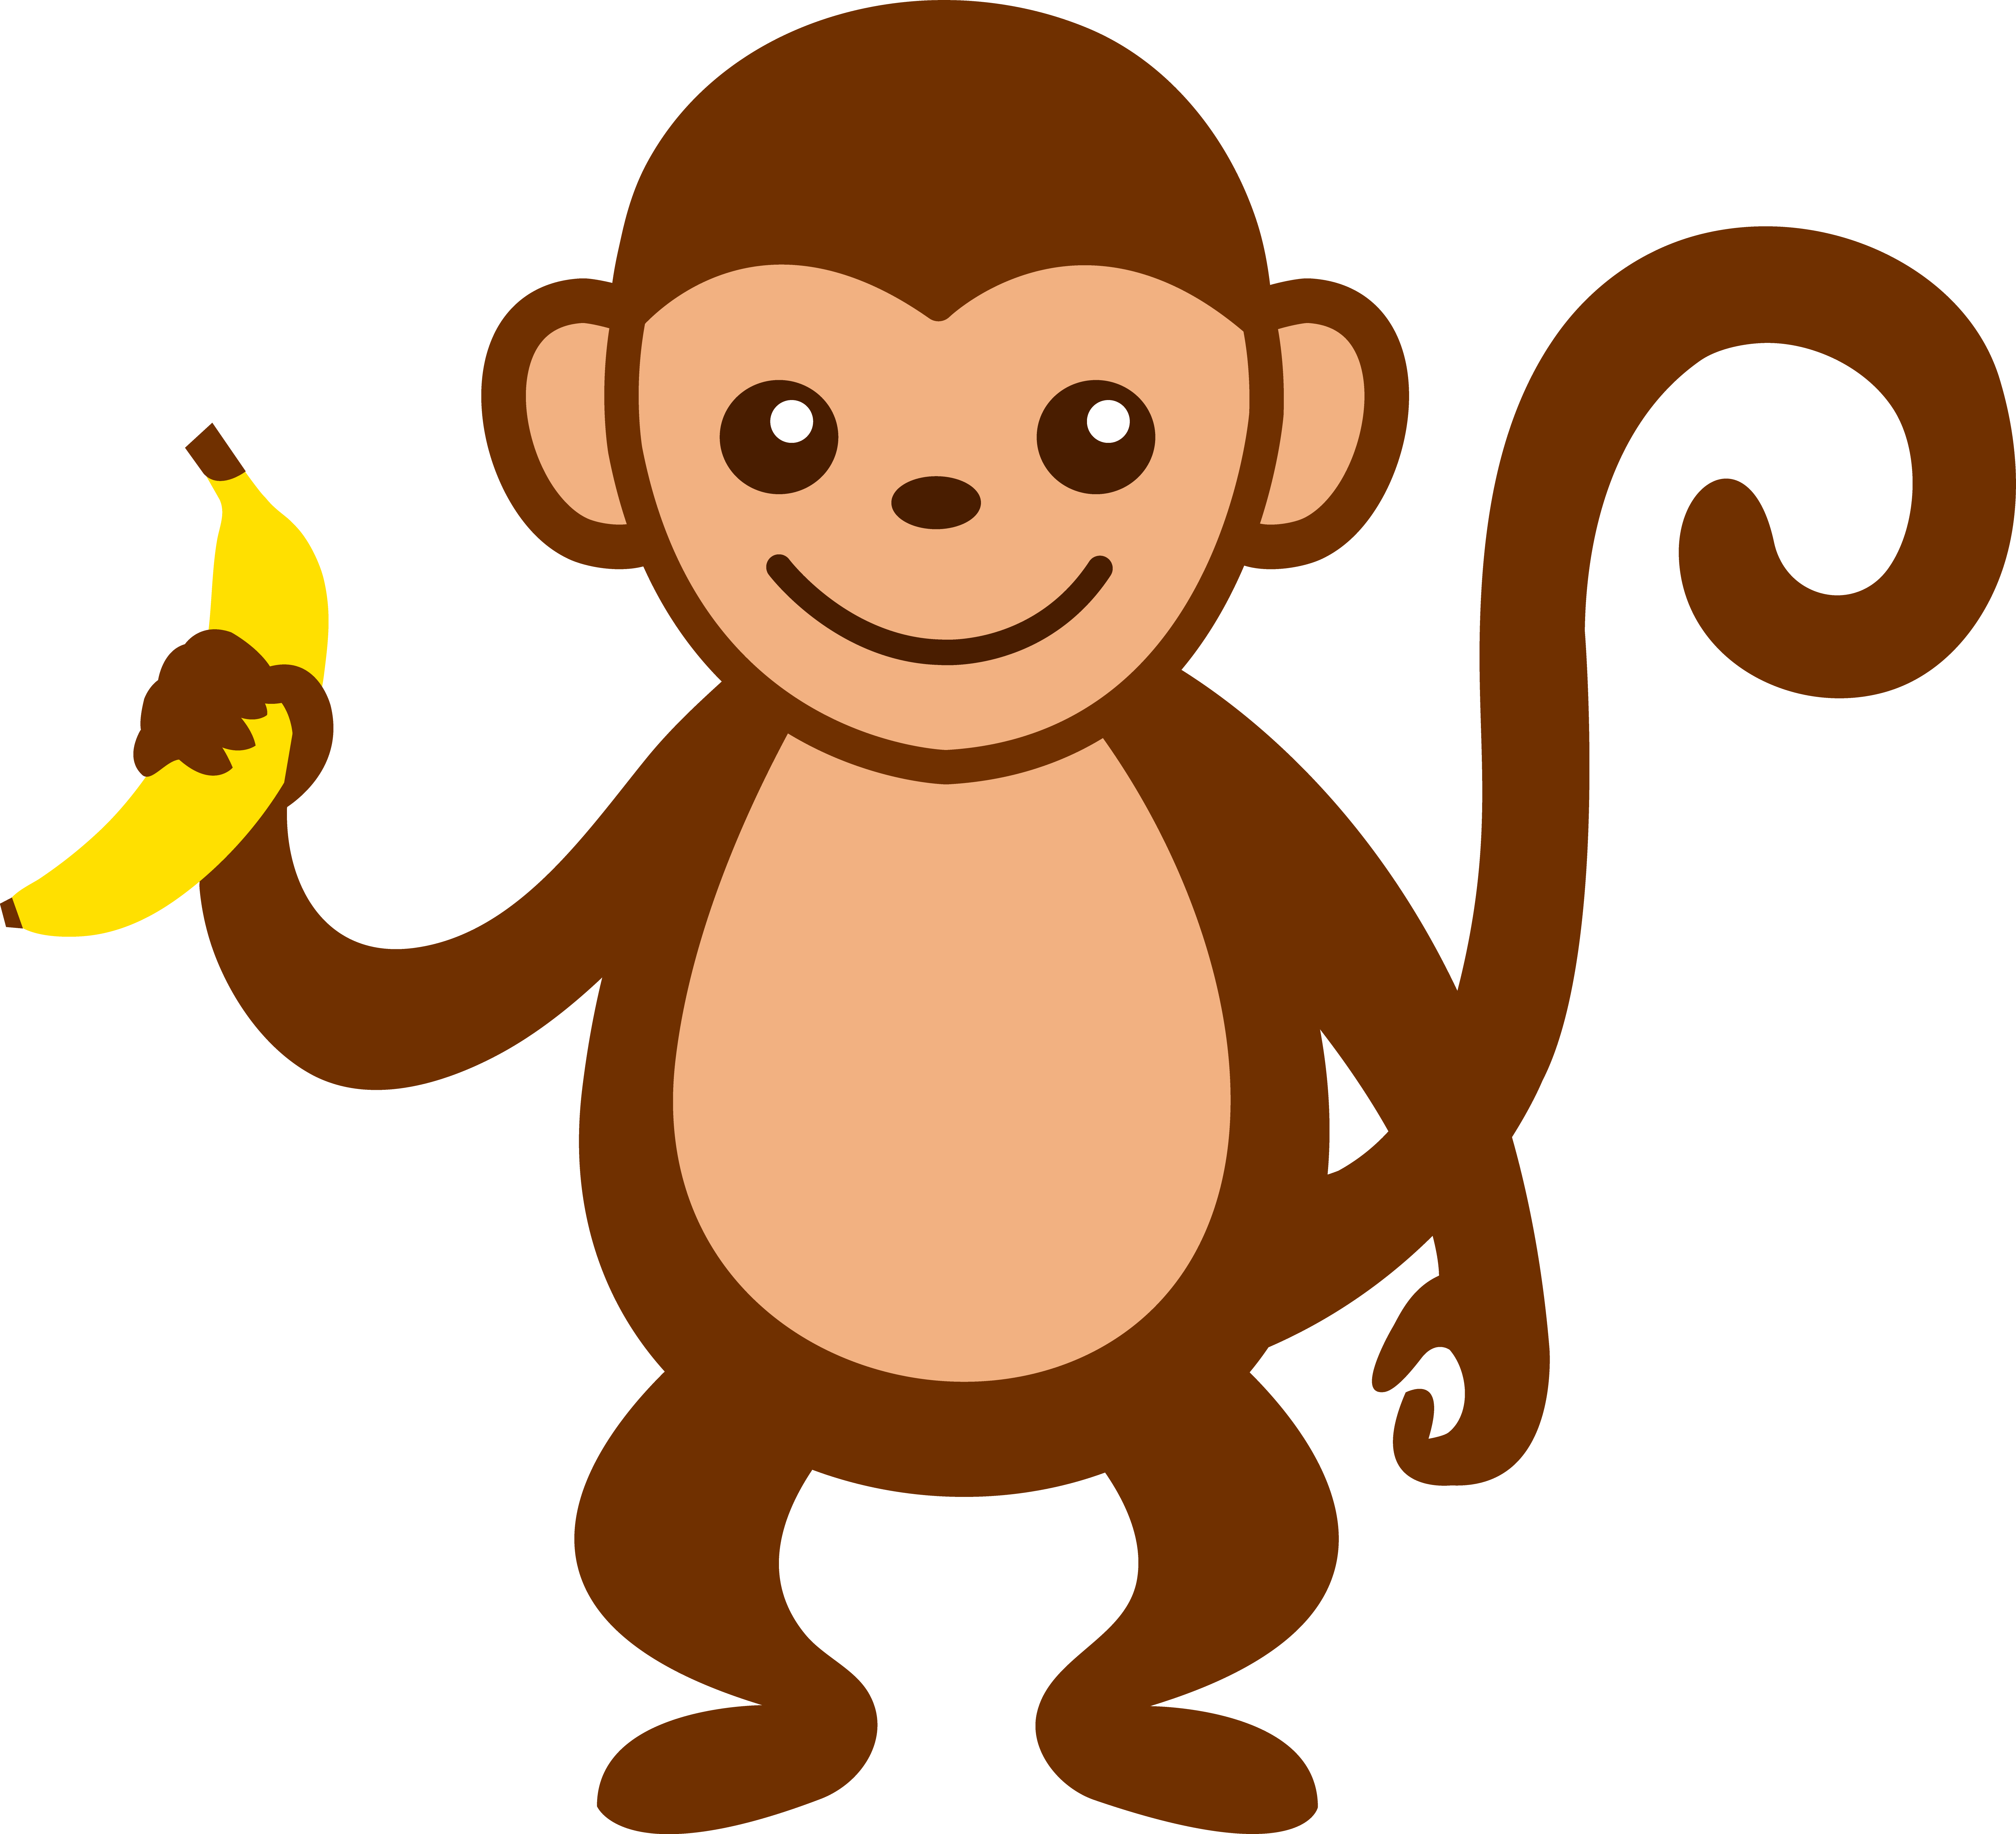 Cute Monkey With Banana.